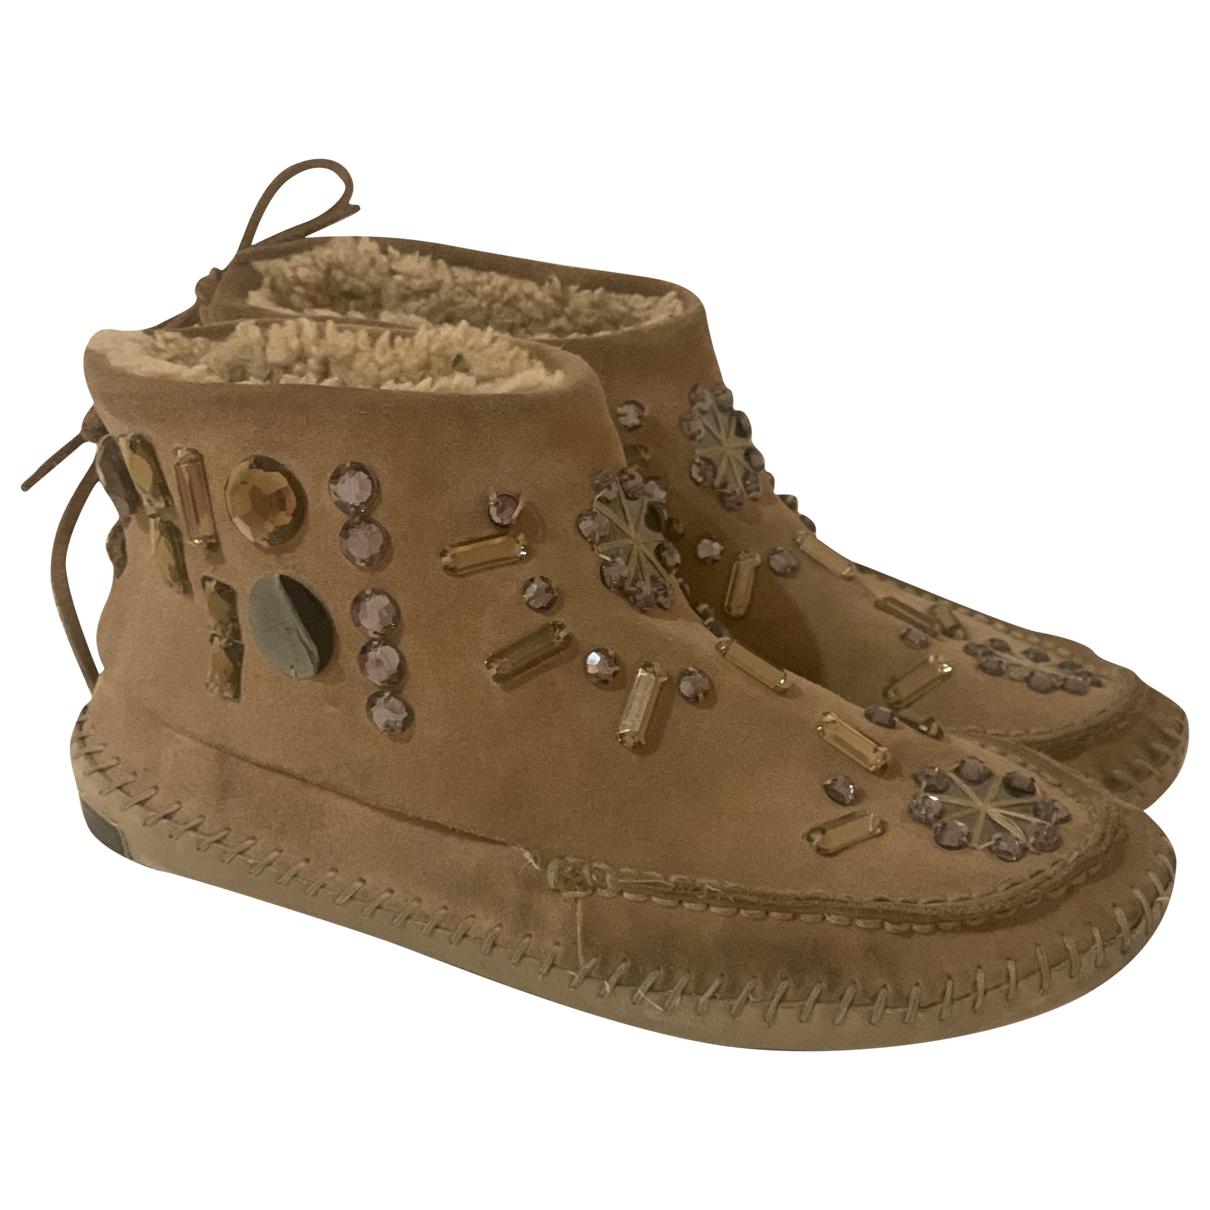 Tory Burch \N Beige Suede Boots for Women 40 EU